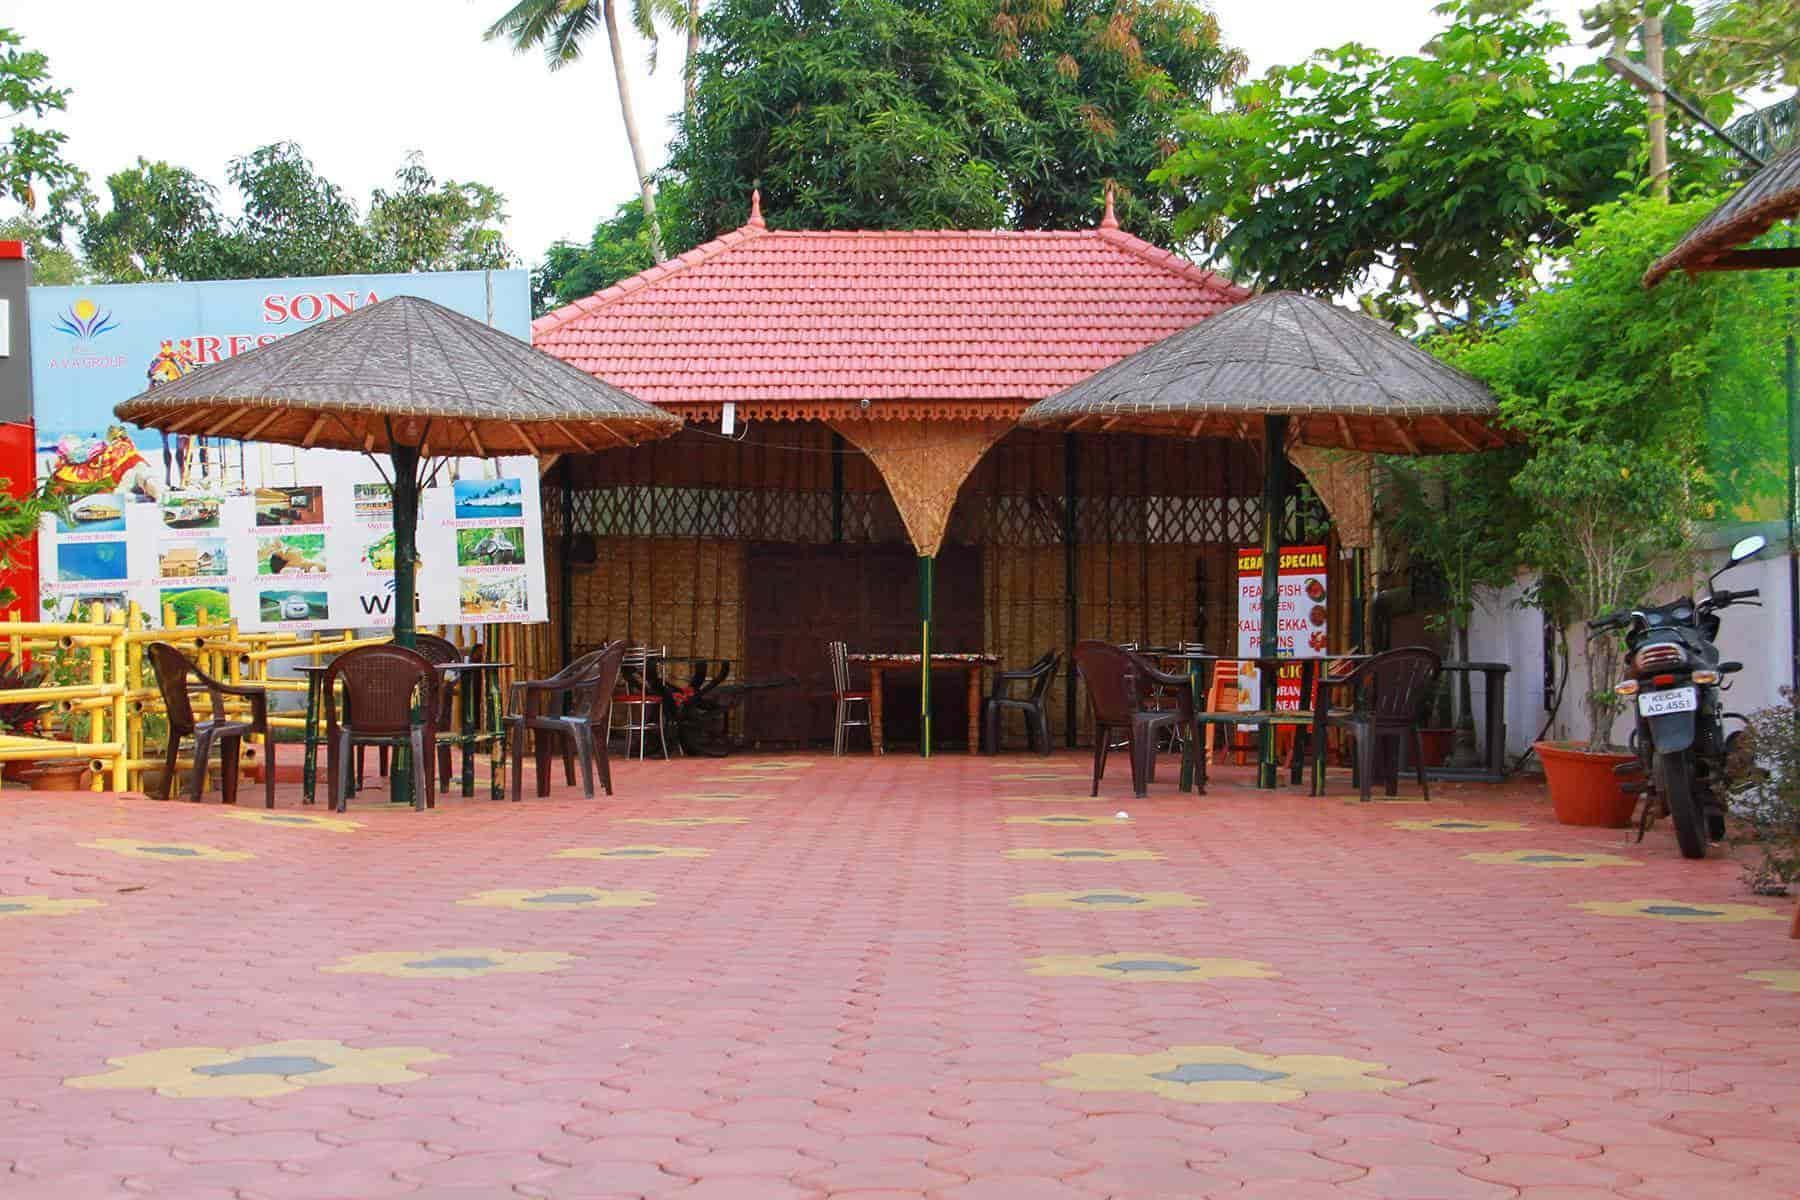 Sona Residency Photos, Thondankulangara, Alappuzha- Pictures